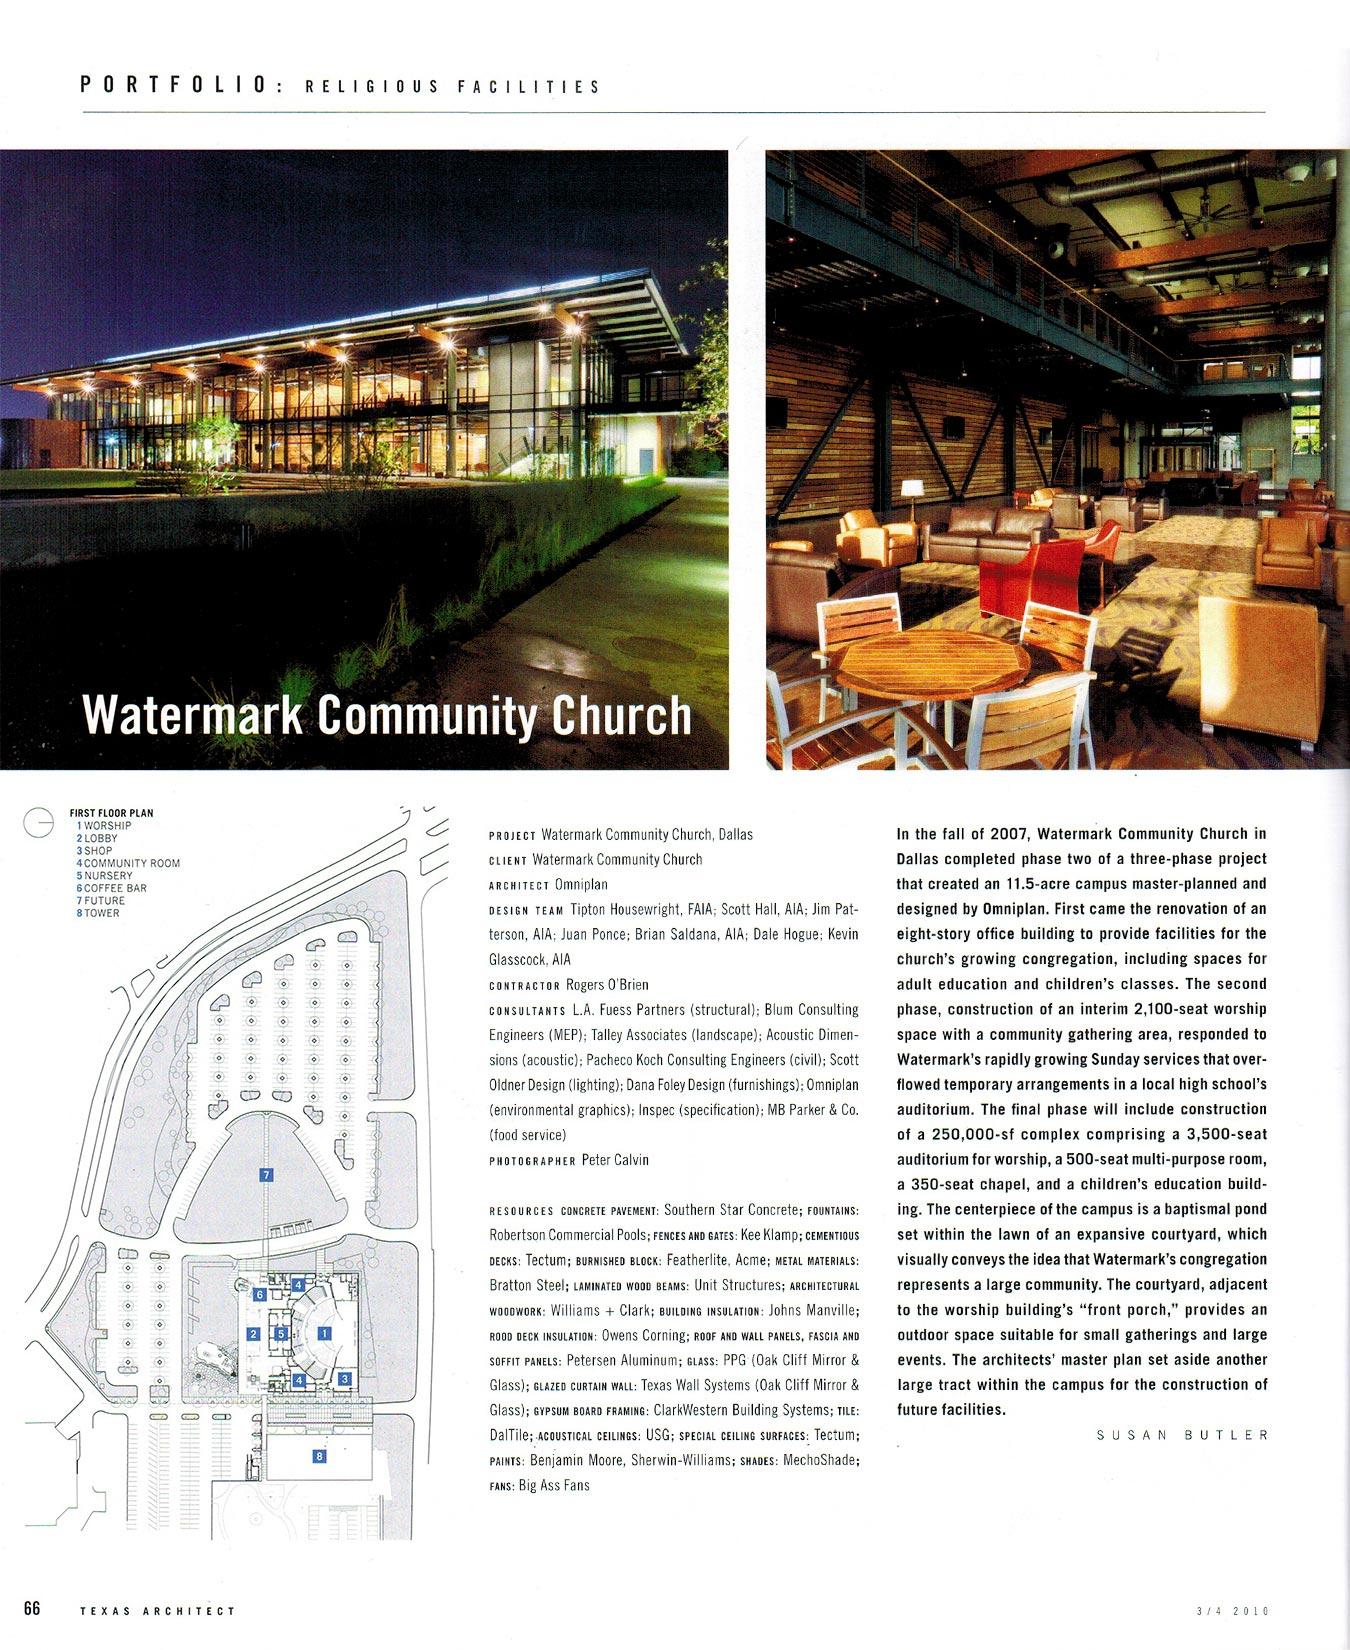 texas-architect-page-1.jpg